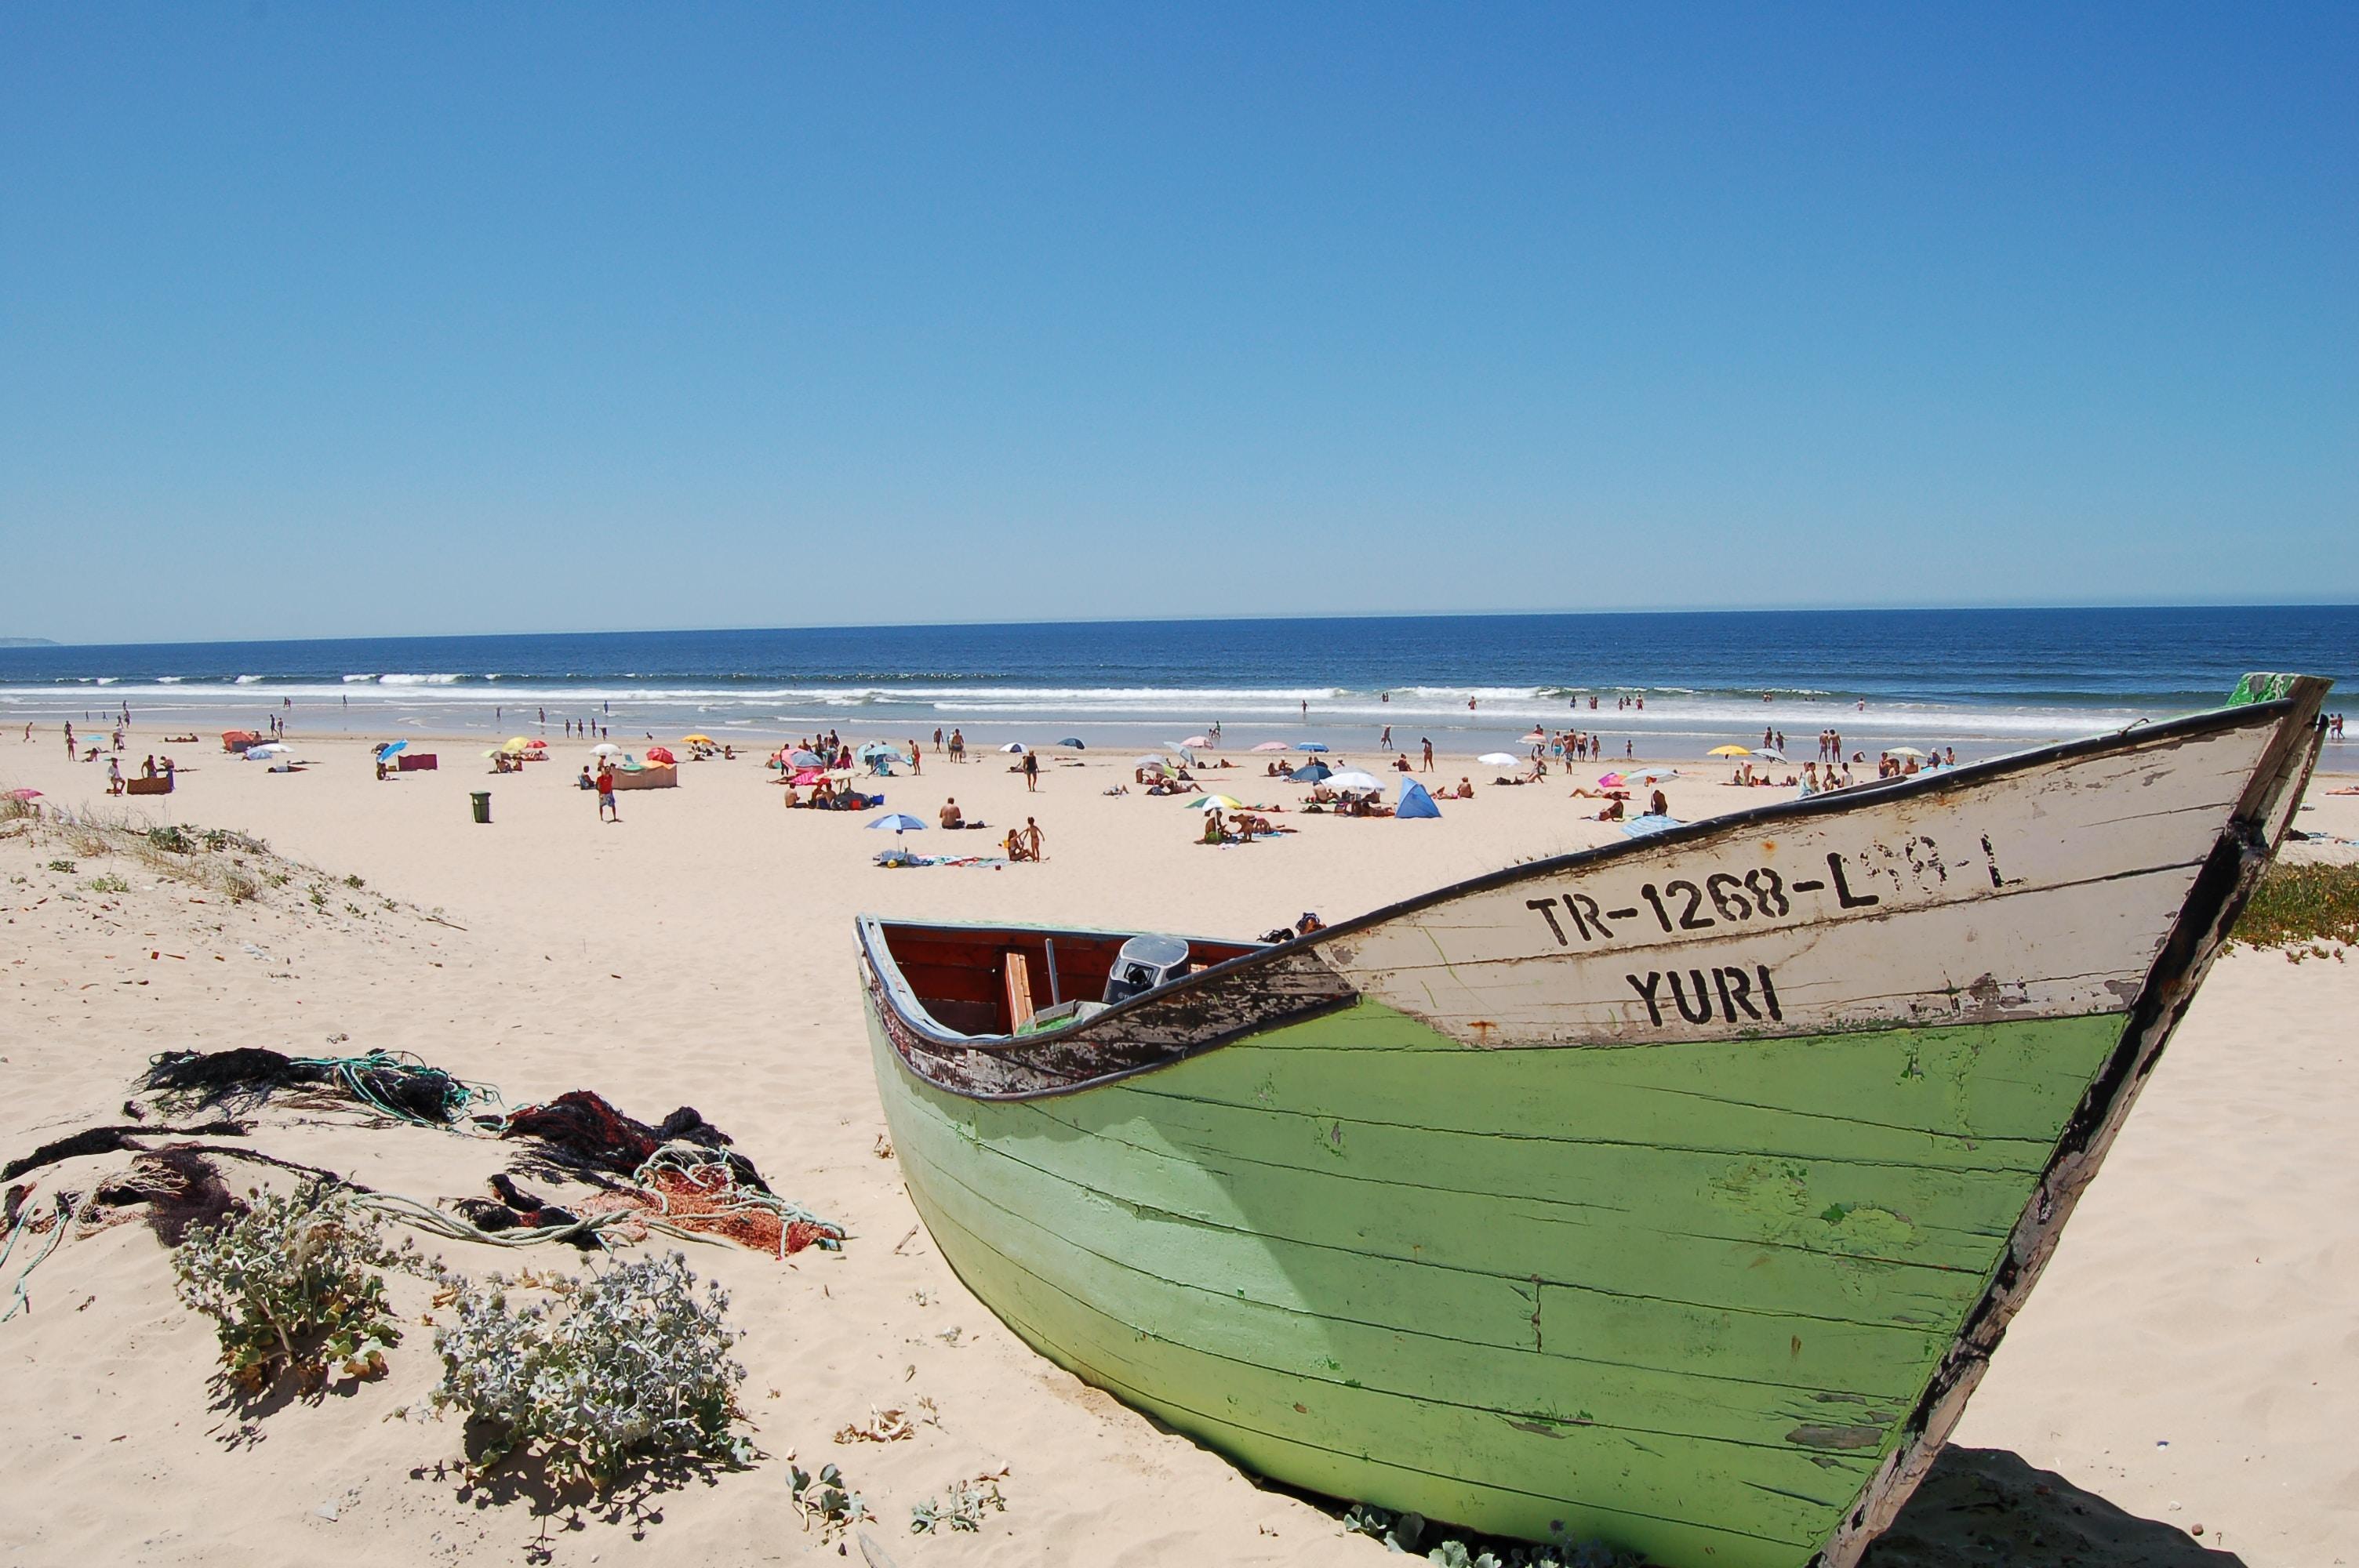 green boat on seashore